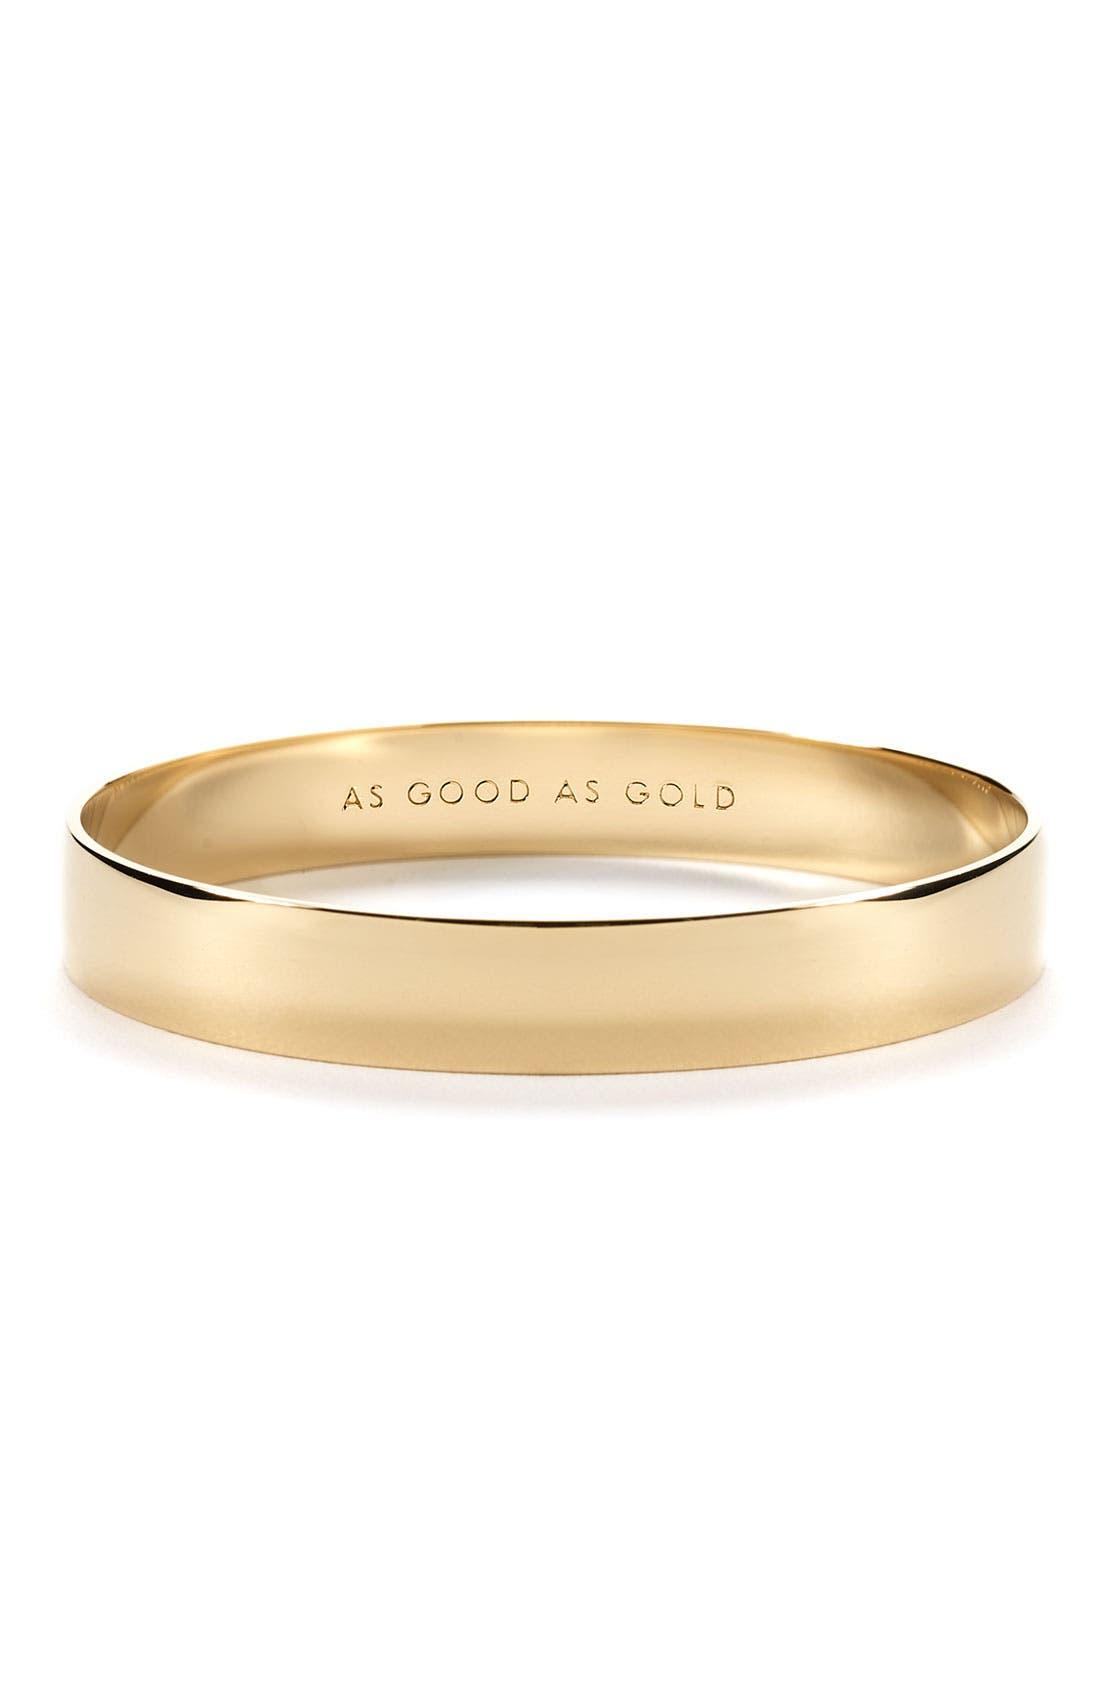 'idiom - good as gold' bangle,                         Main,                         color, Gold